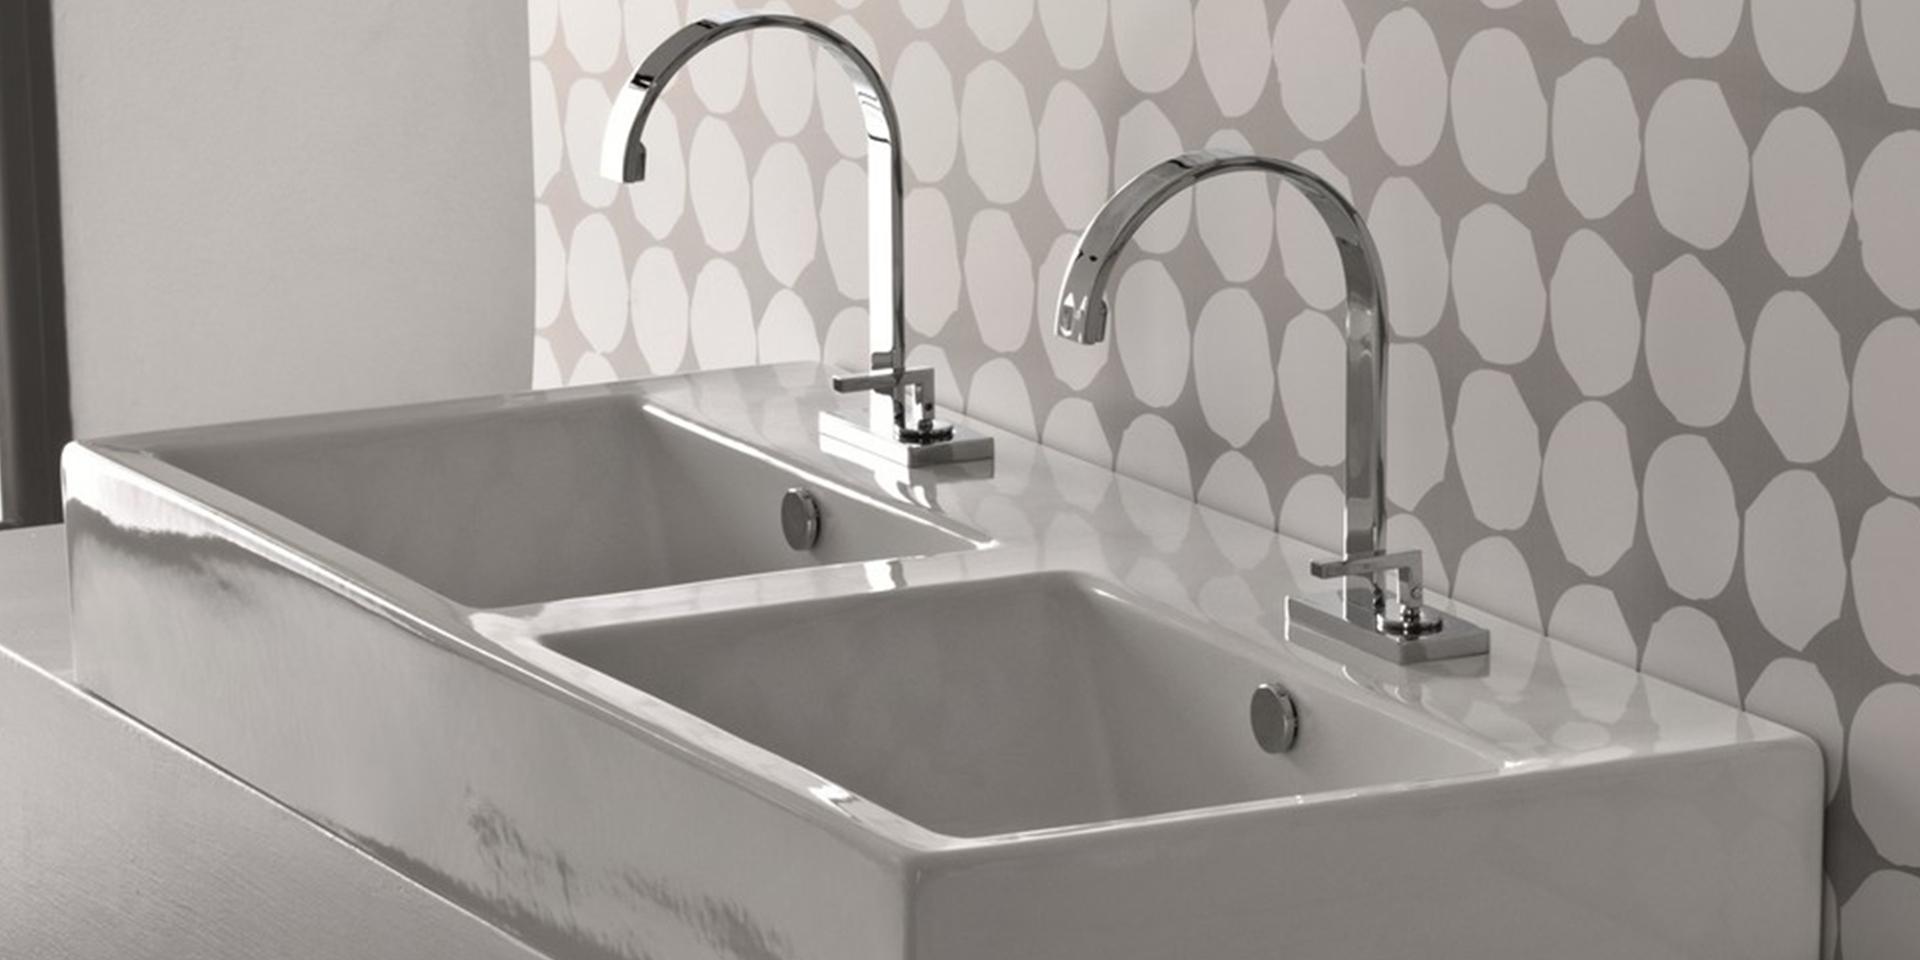 Arredo bagno ecoseledil - Arredo bagno versace home ...